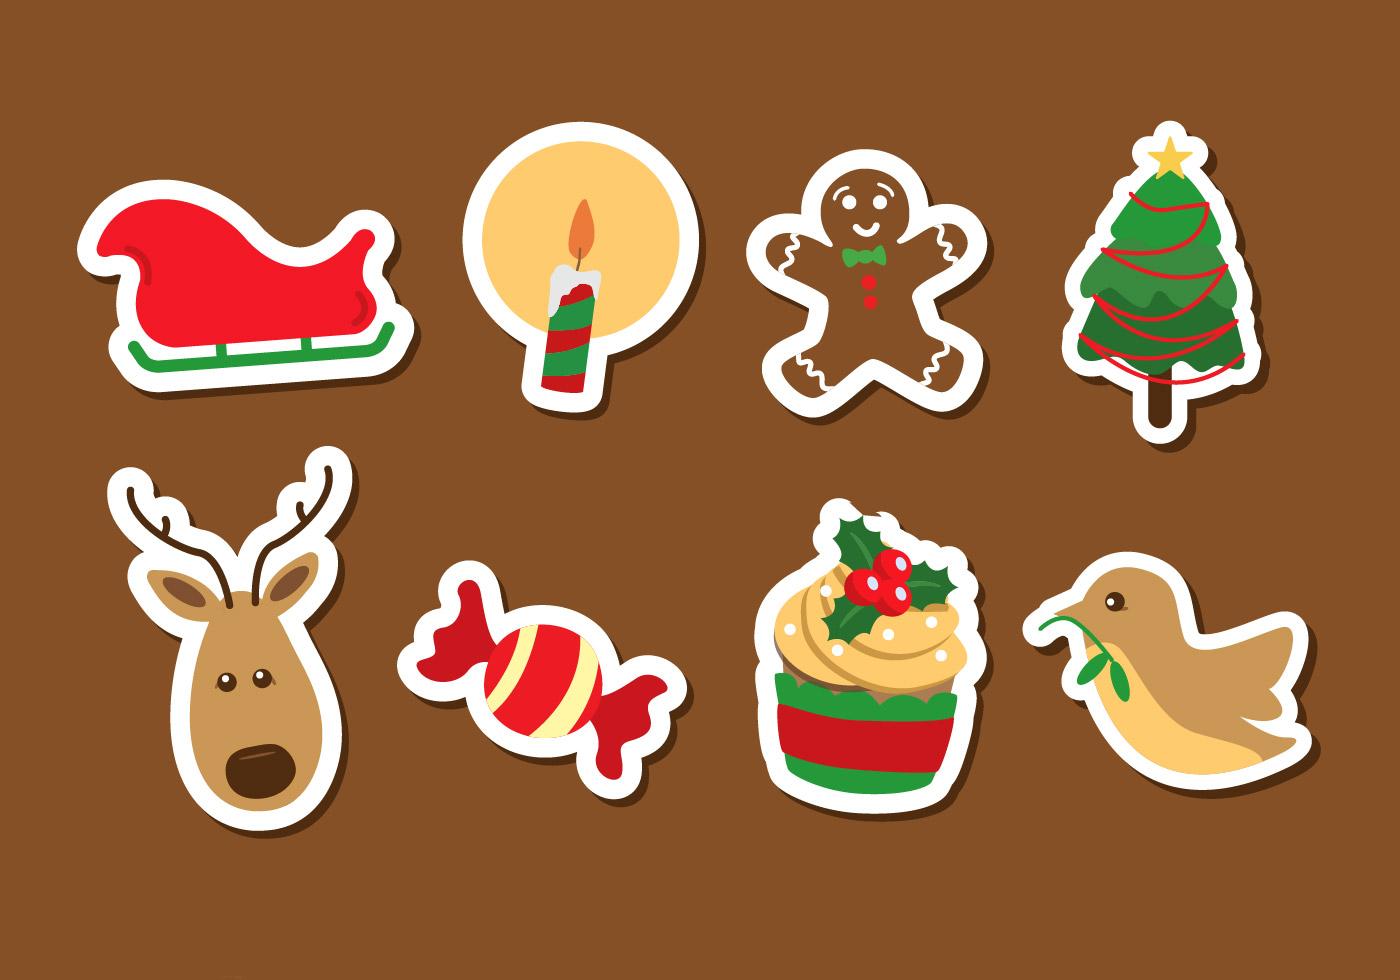 Cute Gingerbread Wallpaper Christmas Icon Vector Download Free Vector Art Stock